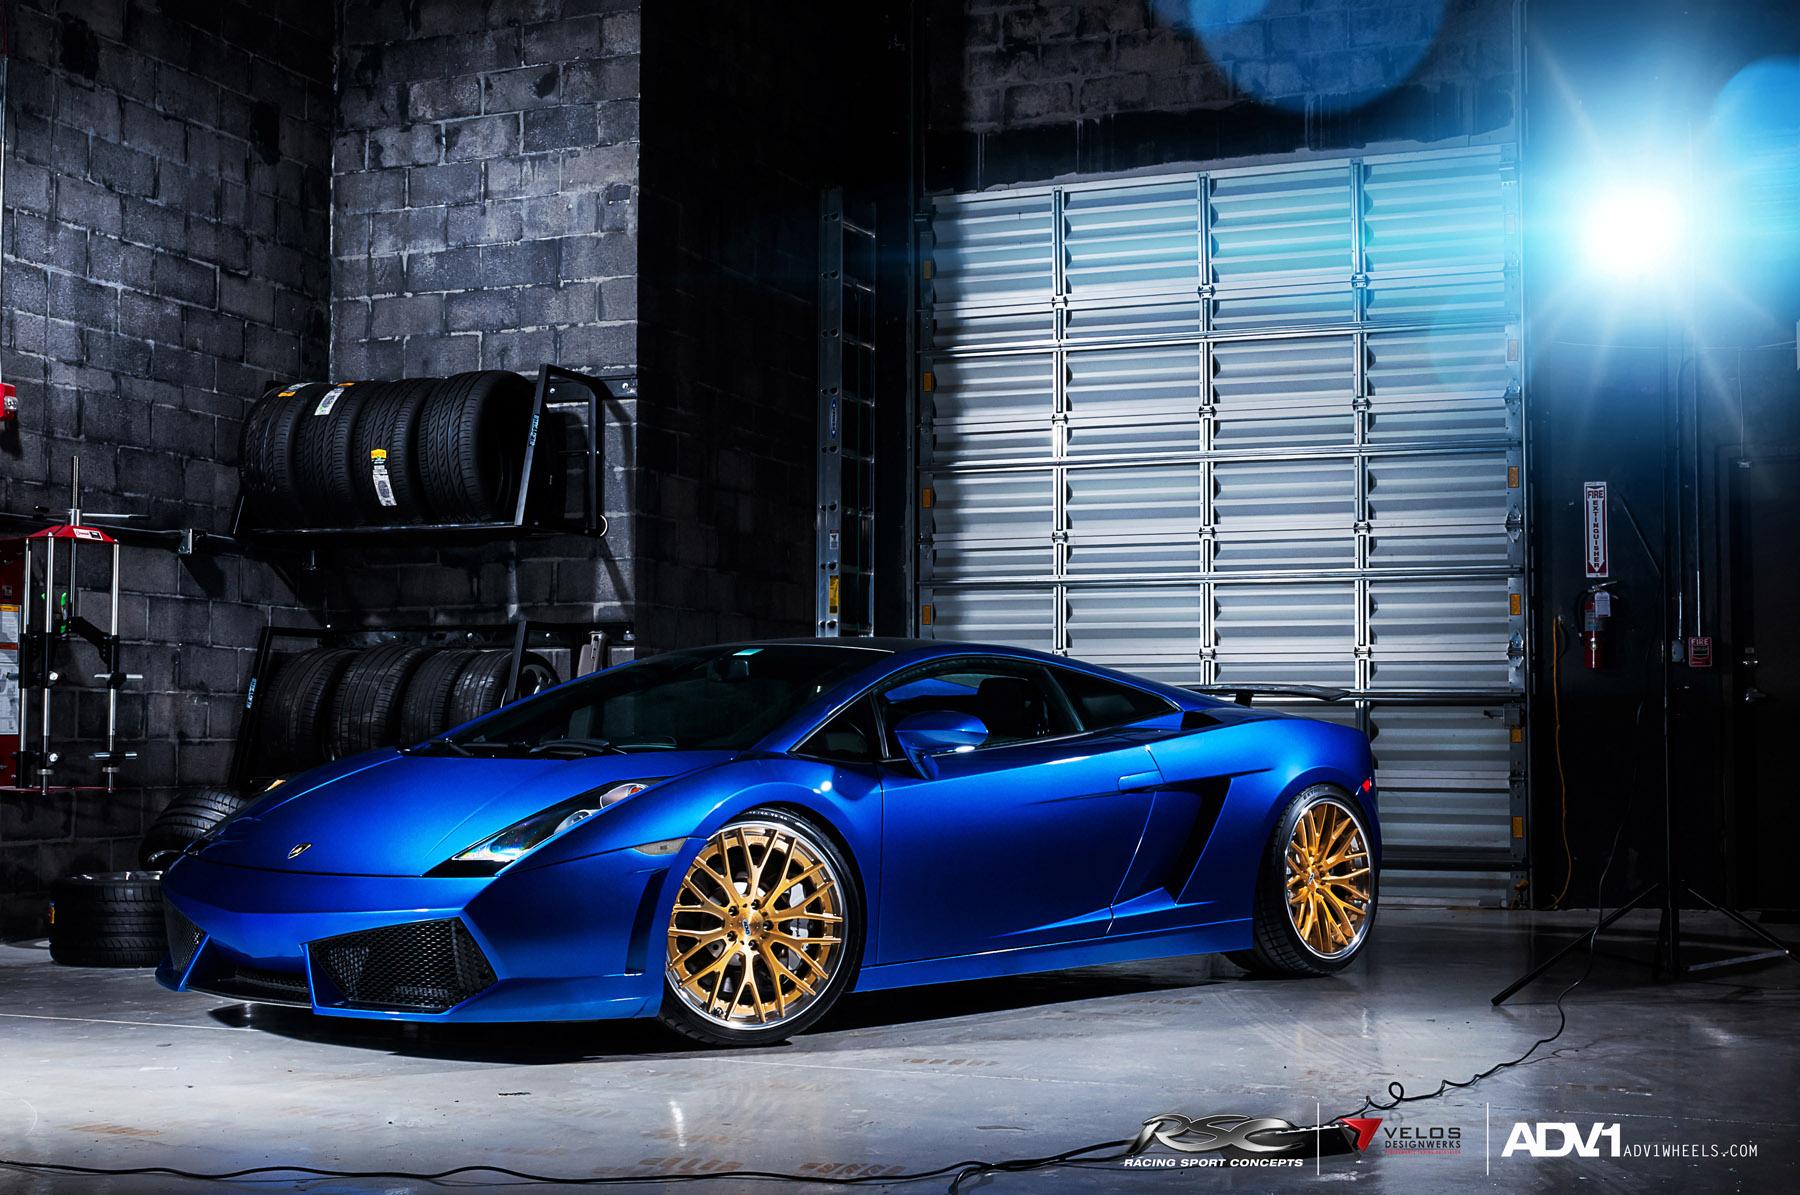 ADV.1 колеса Lamborghini Gallardo ADV10.0TS SL Gold Edition  - фотография №2